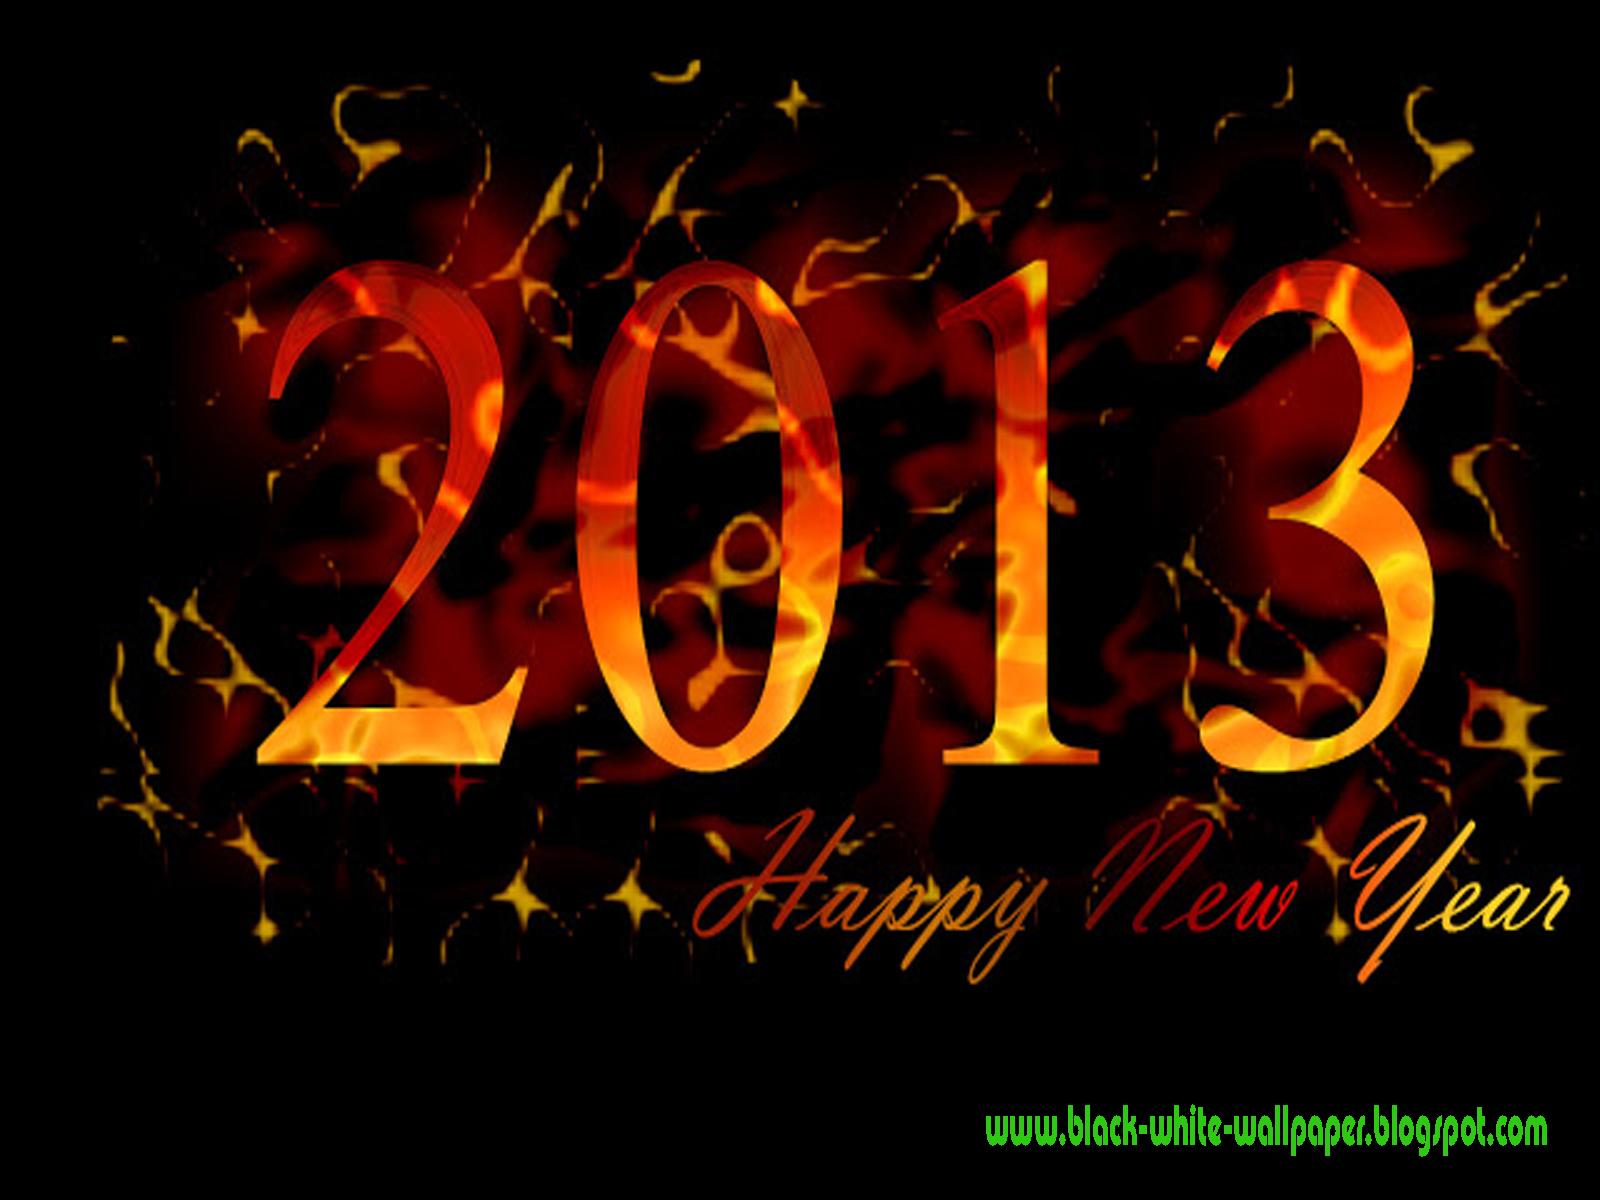 new year wallpaper - thumbgal